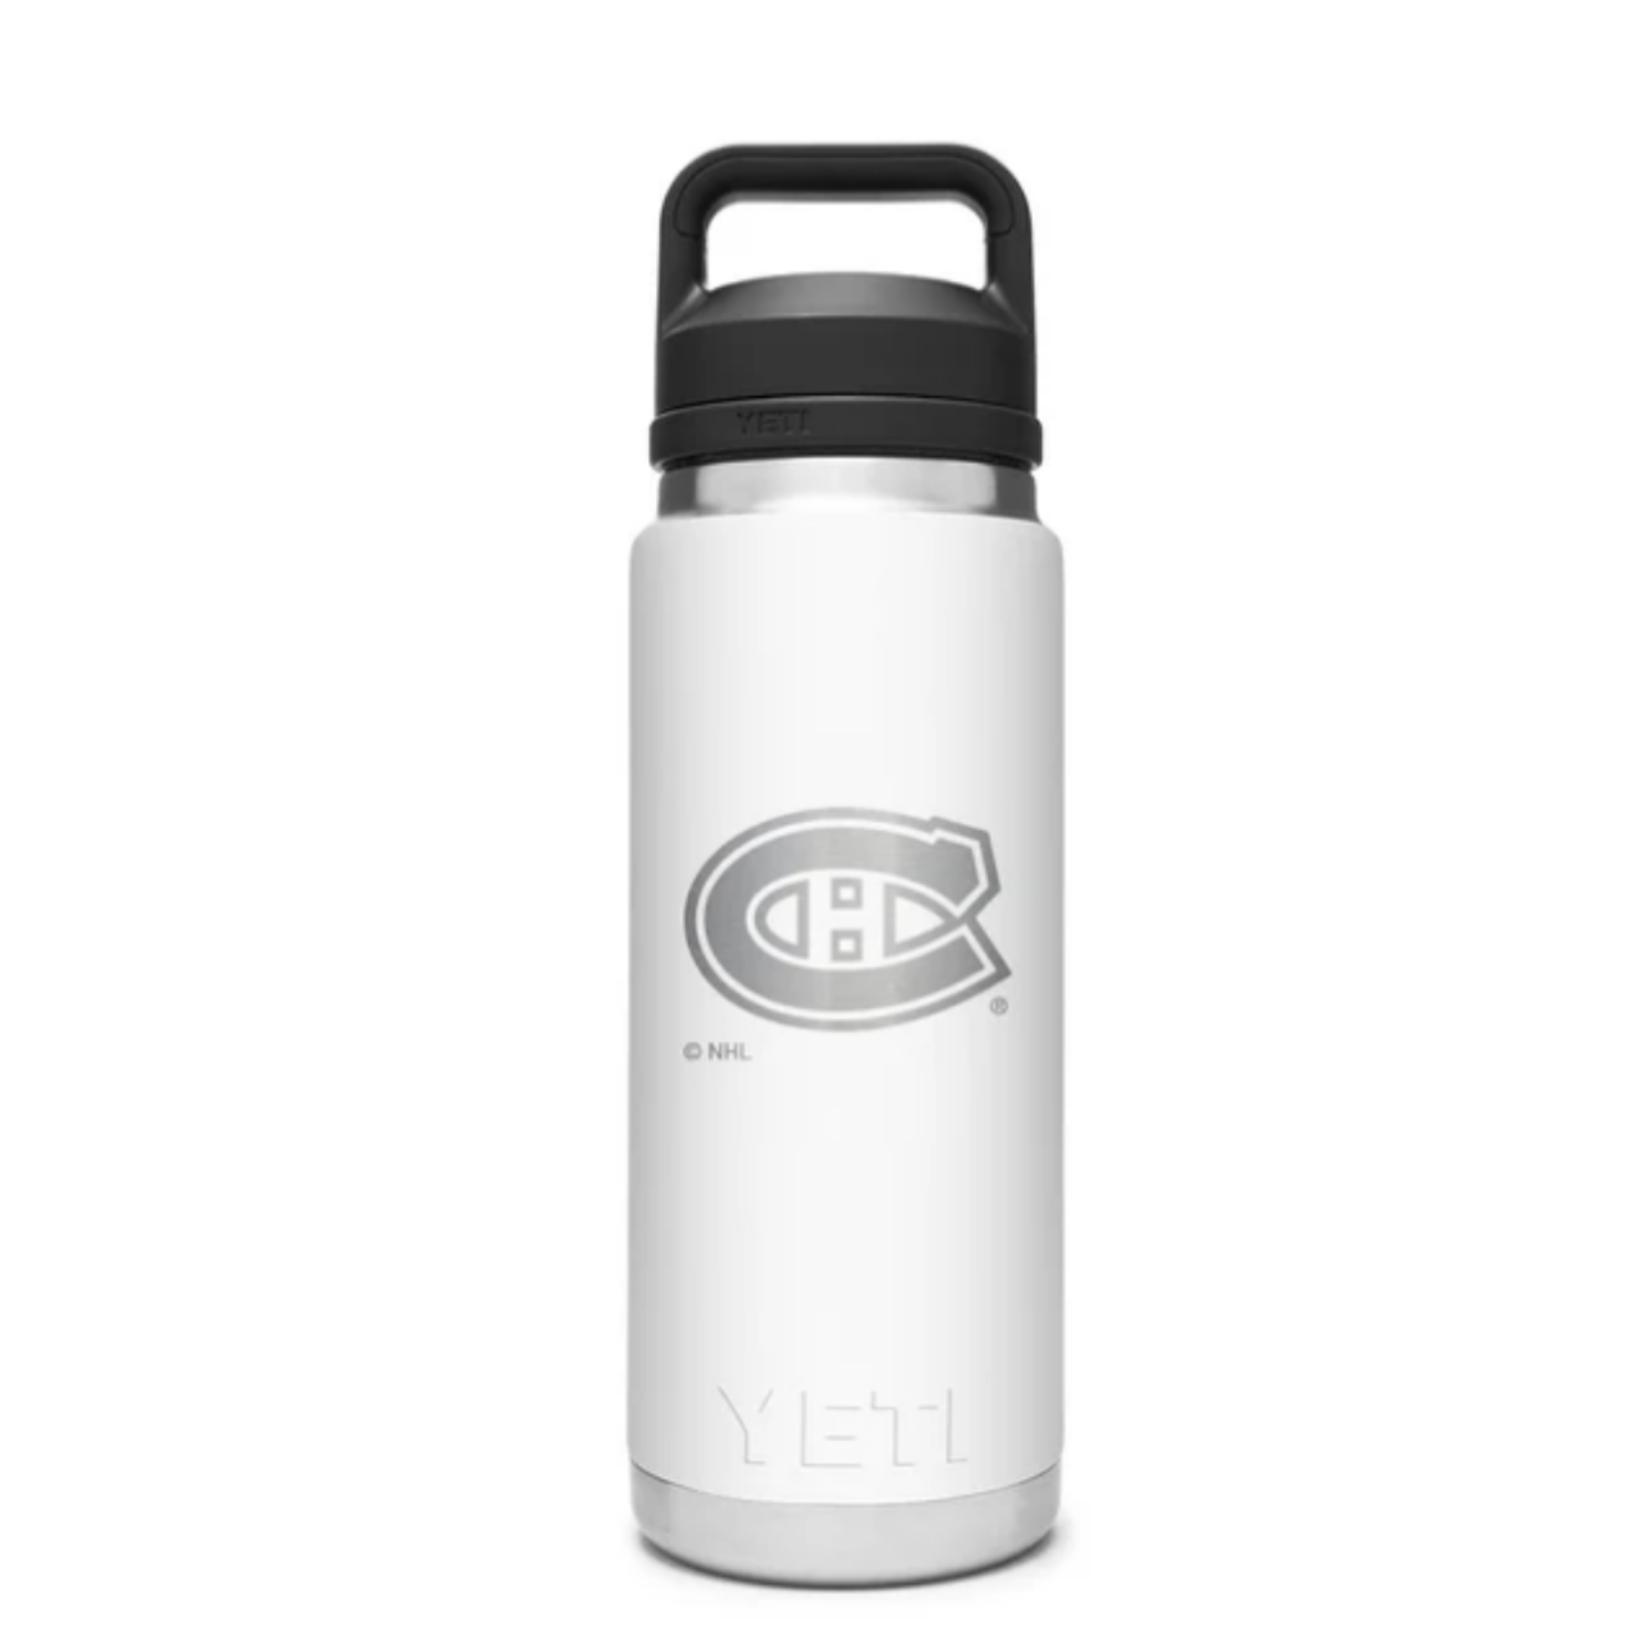 YETI NHL 26oz Bottle w/Chug Cap